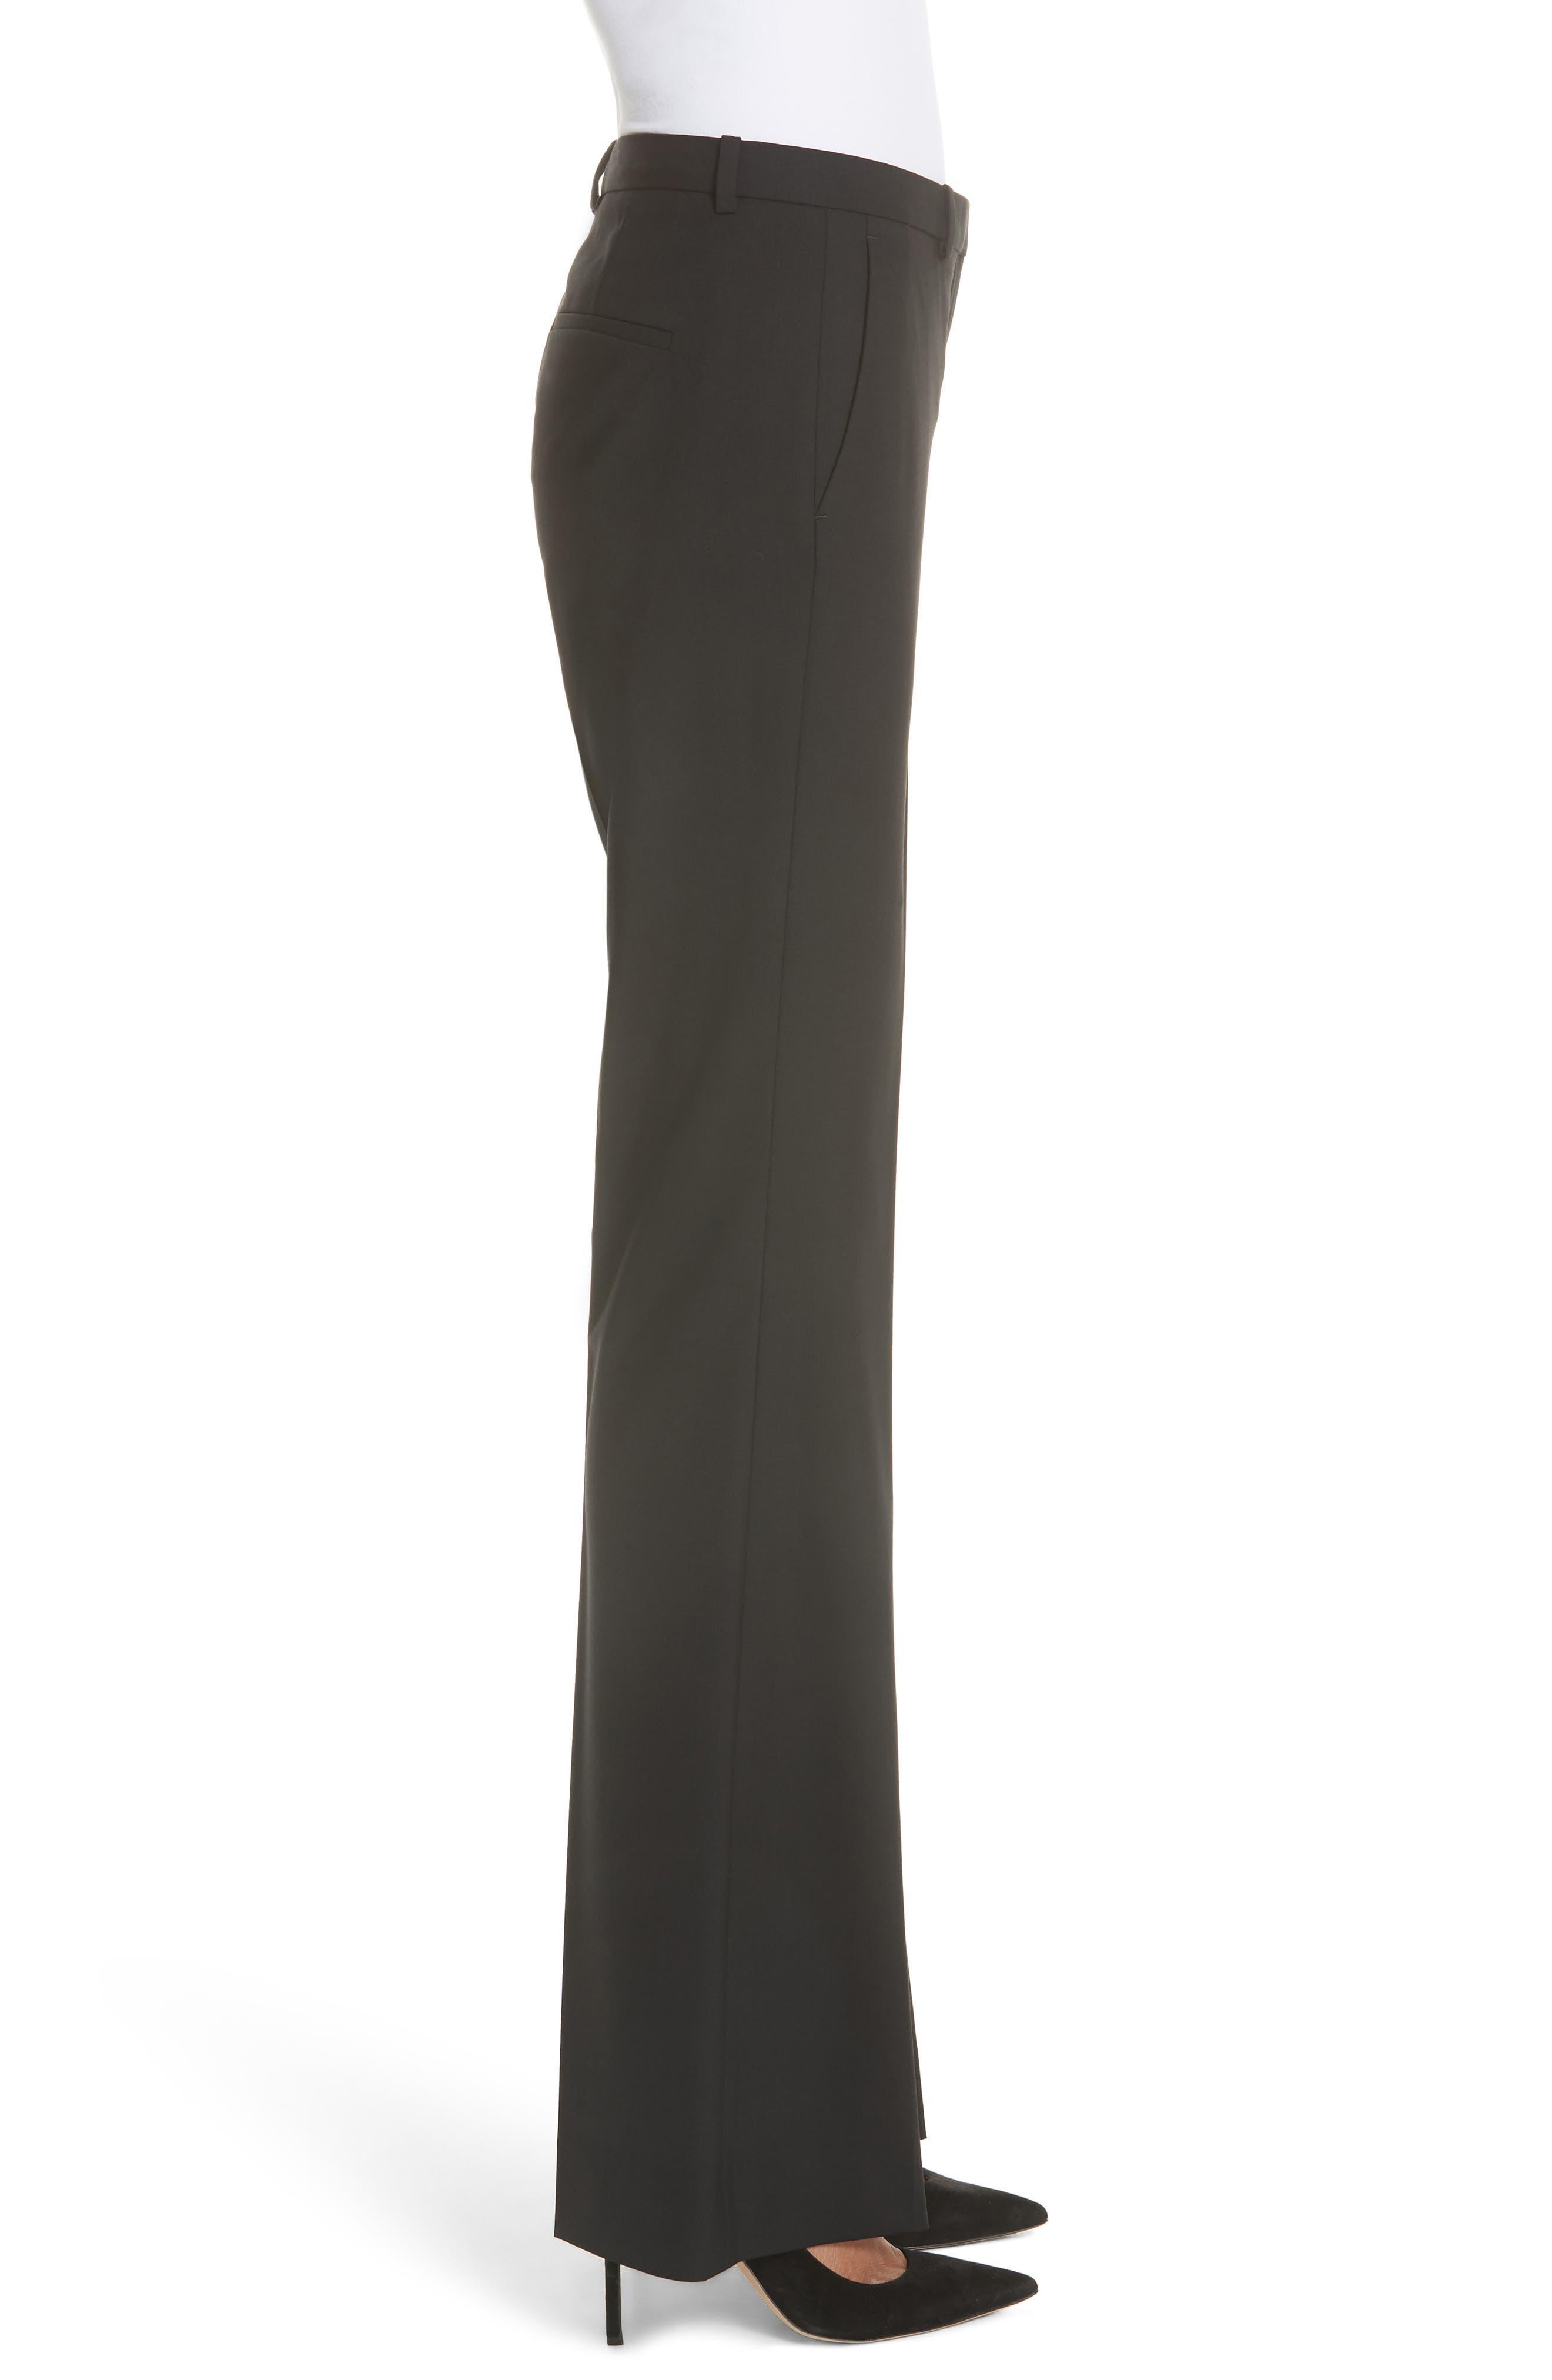 Demitria 2 Stretch Wool Suit Pants,                             Alternate thumbnail 3, color,                             Black